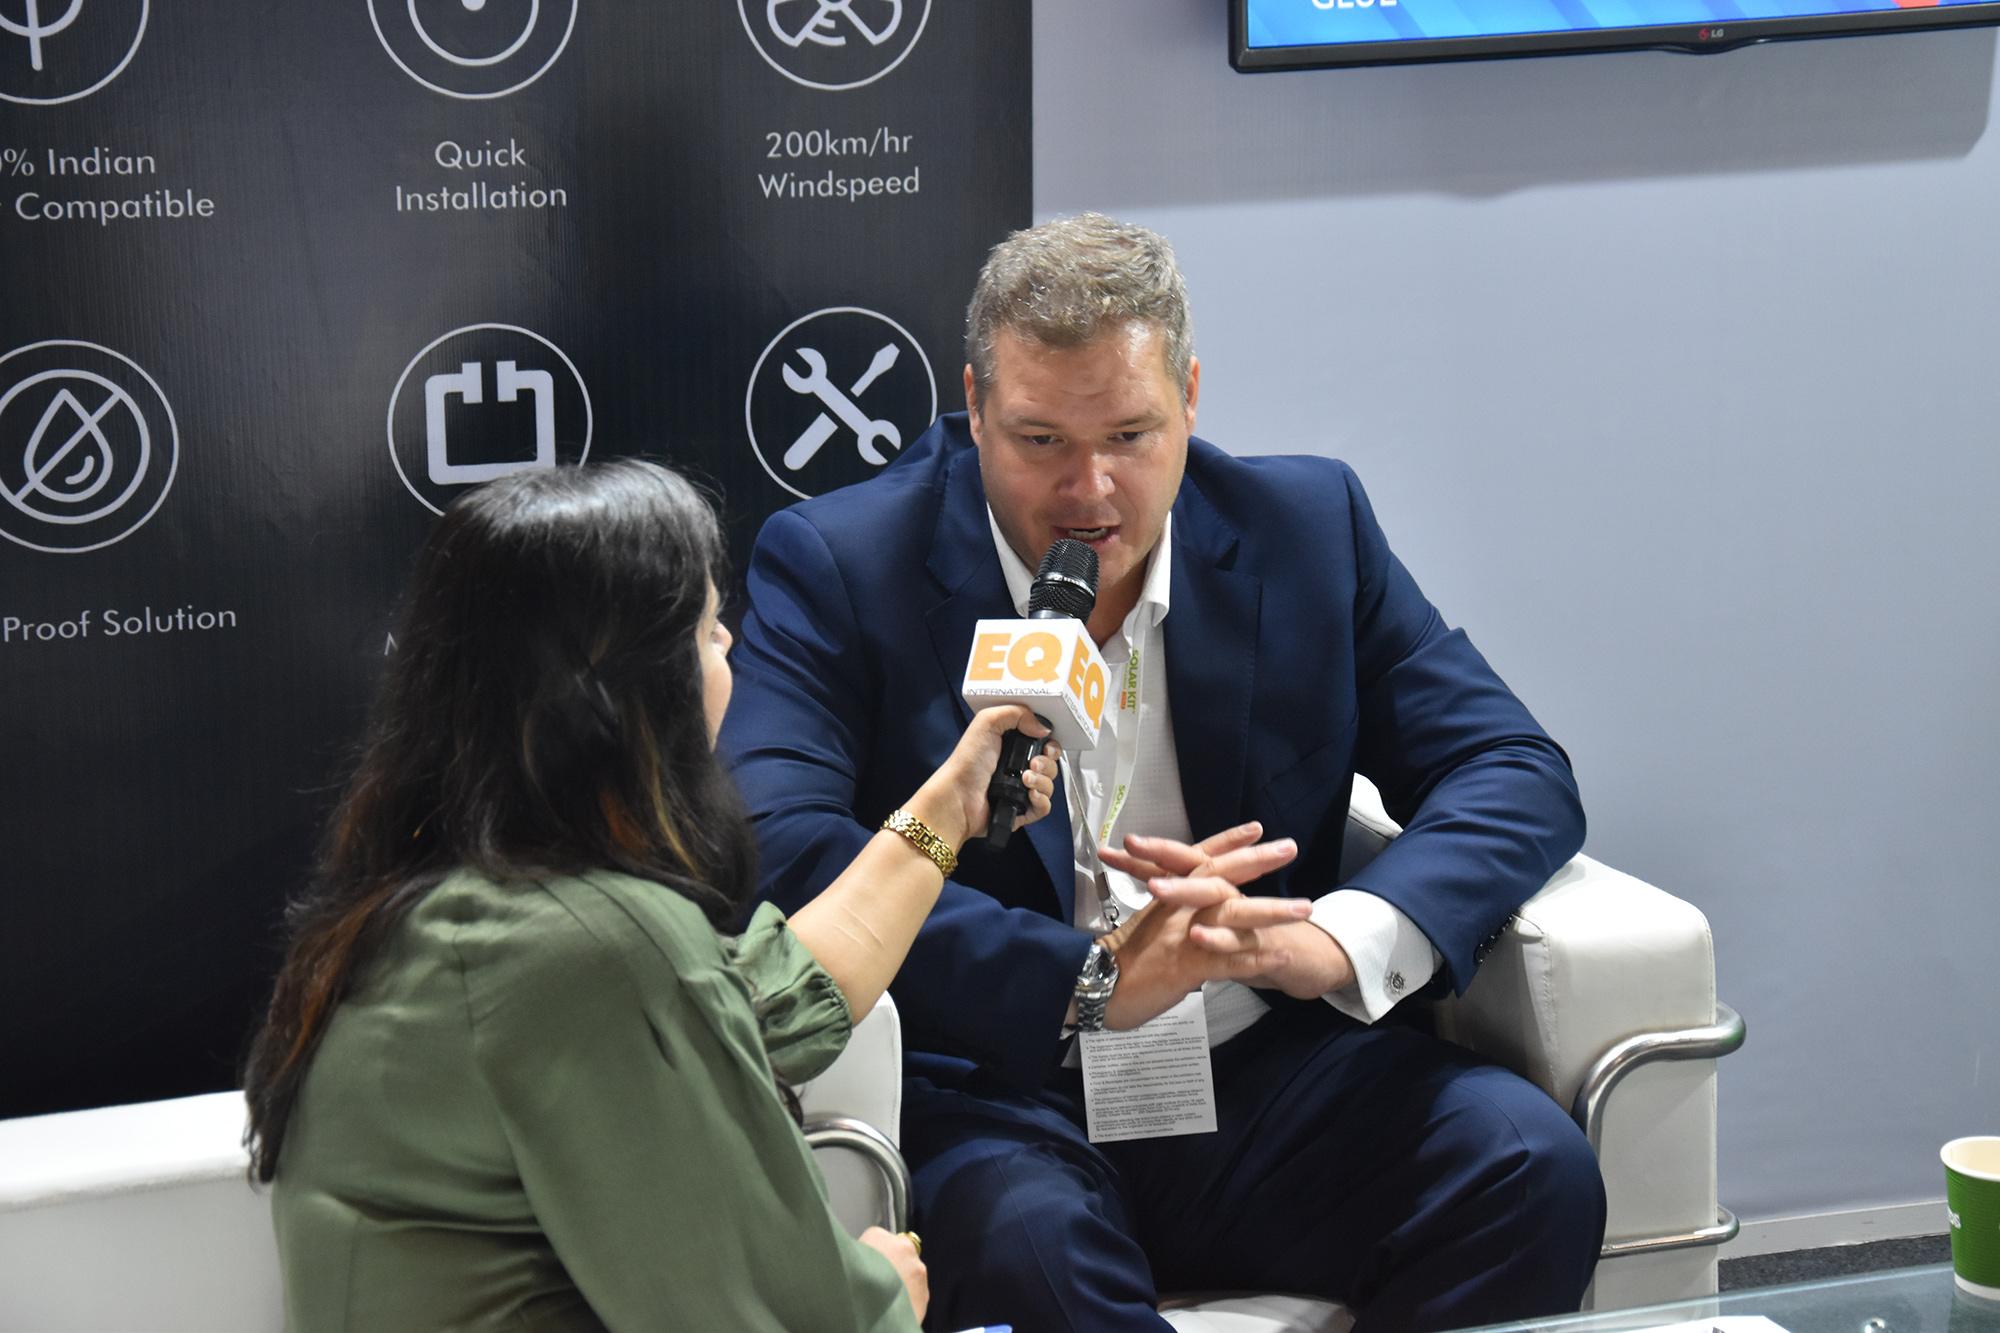 Interview EQ magazine with Tomas Korostensky in REI2019